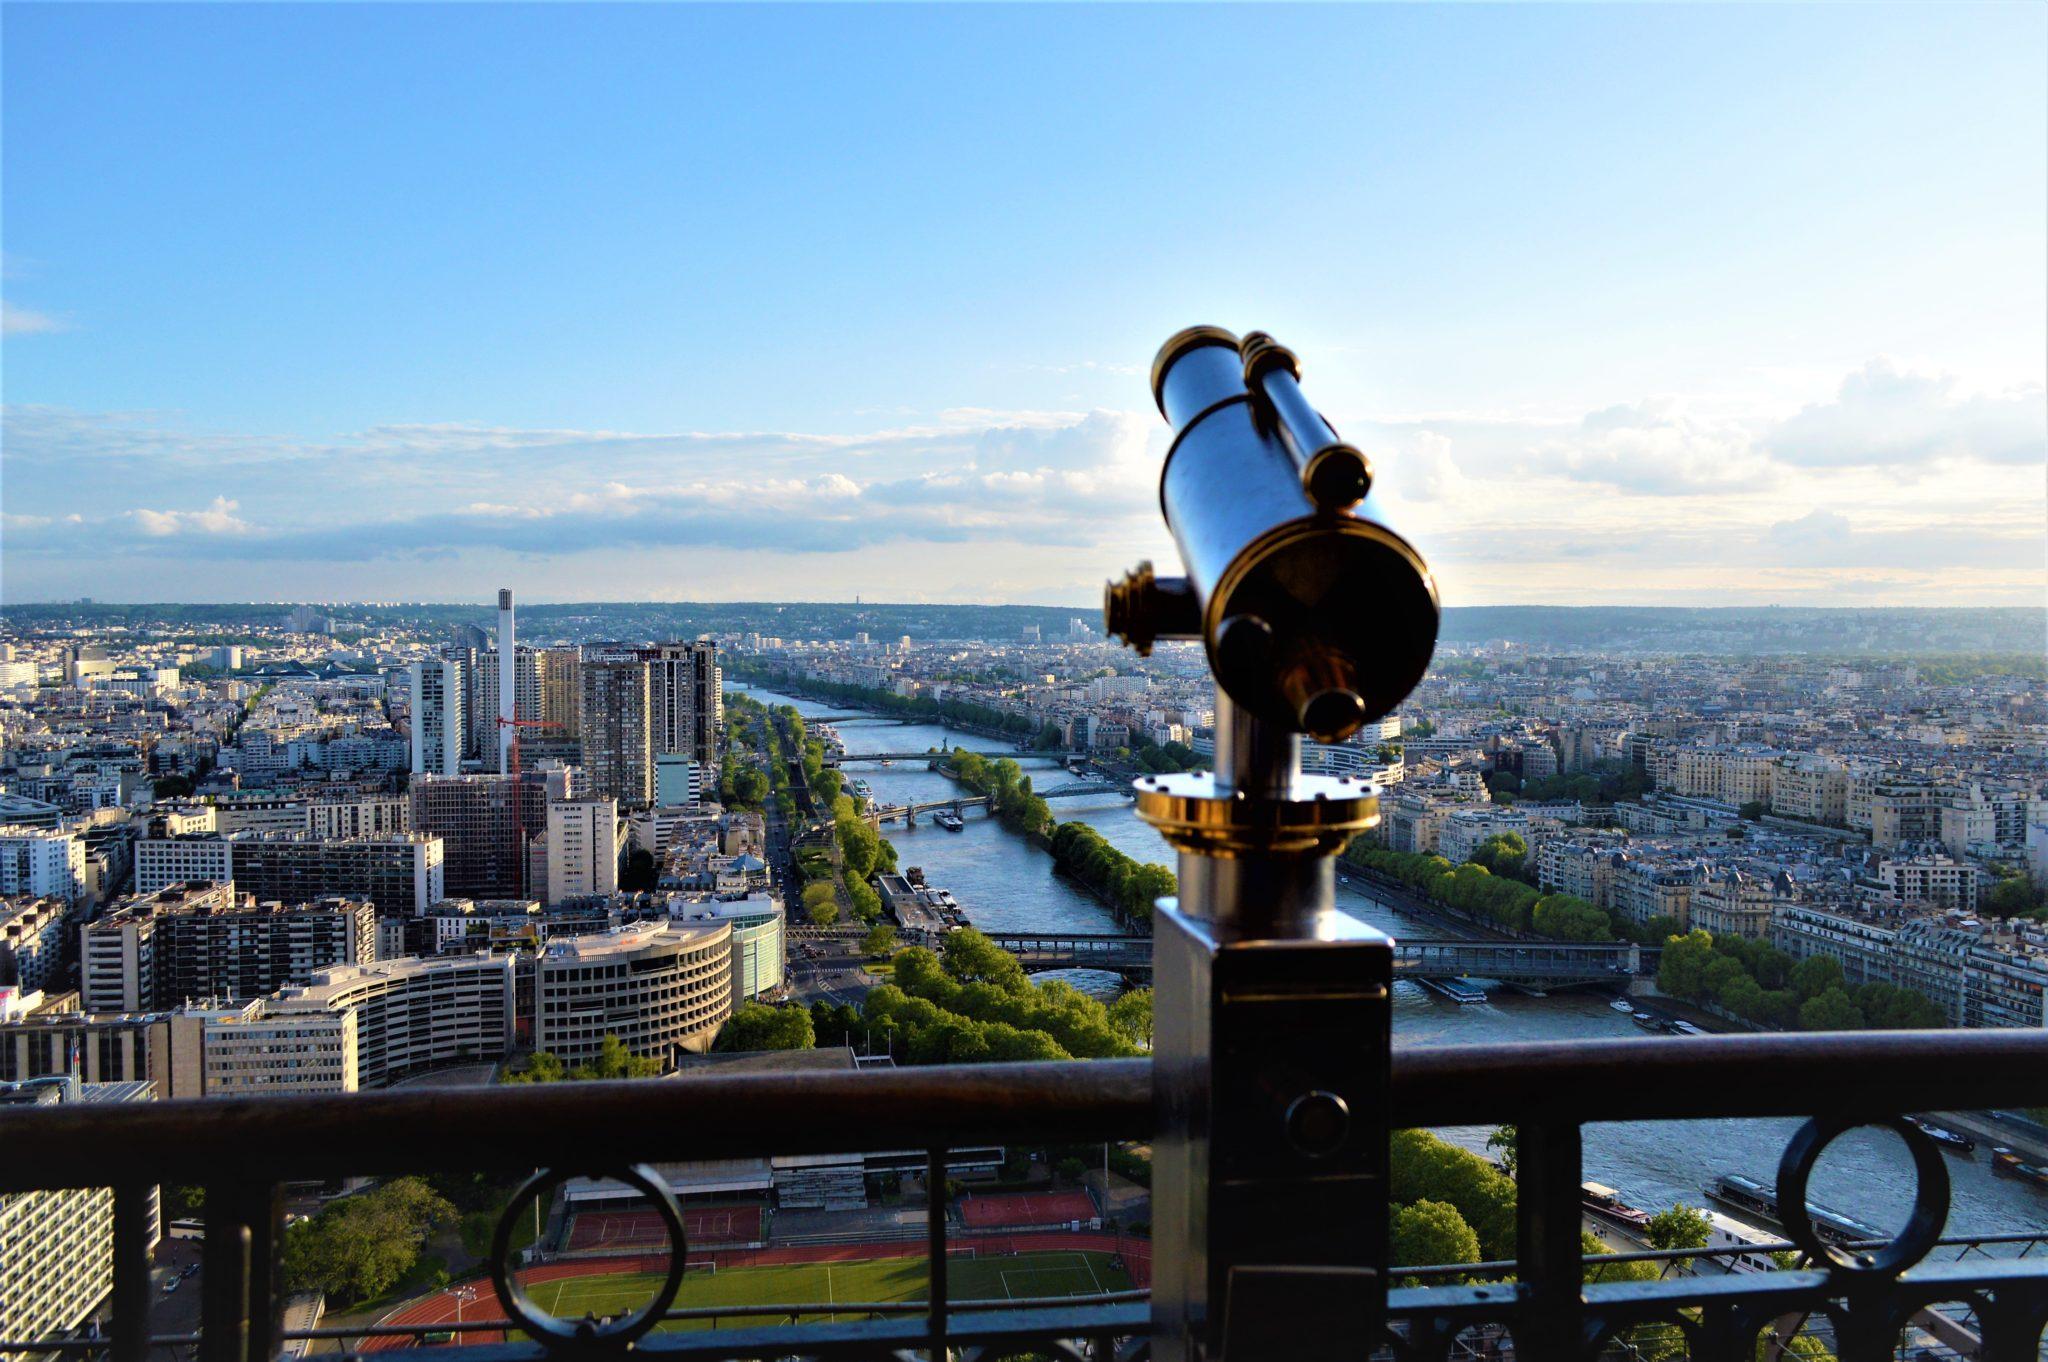 Telescope half way up Eiffel Tower, Paris, France